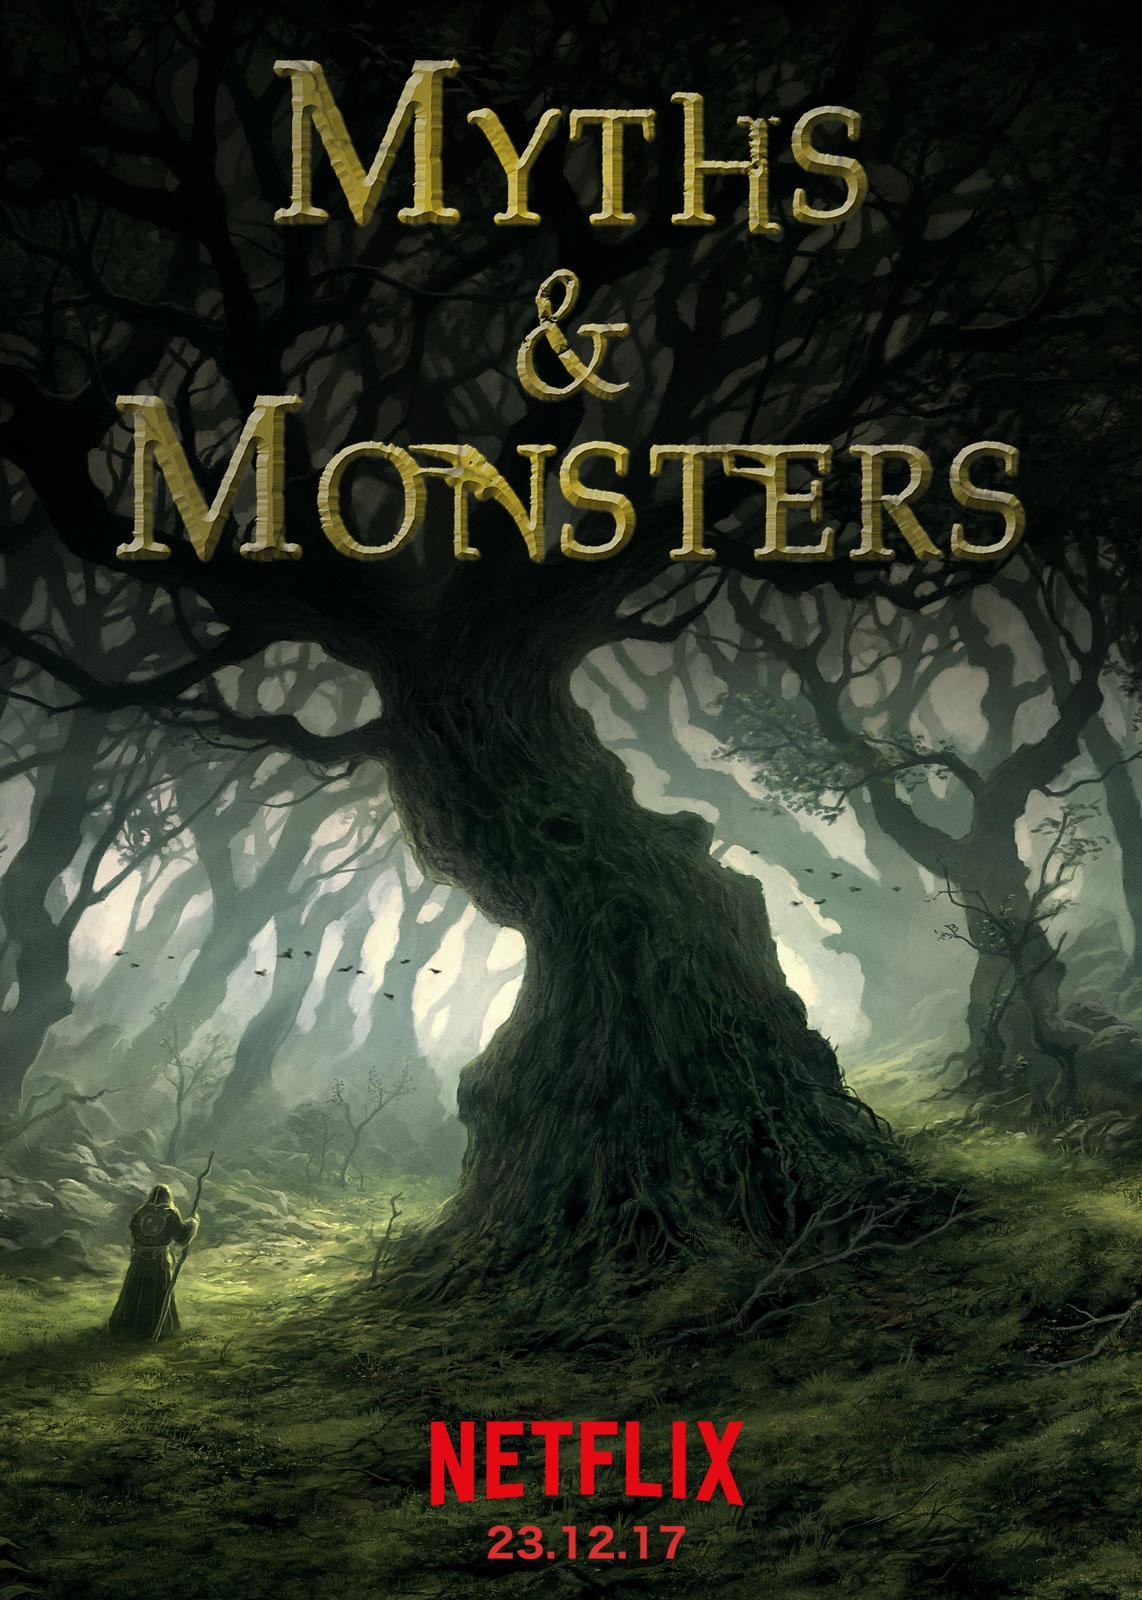 Myths & Monsters (TV Series 2017– ) - IMDb